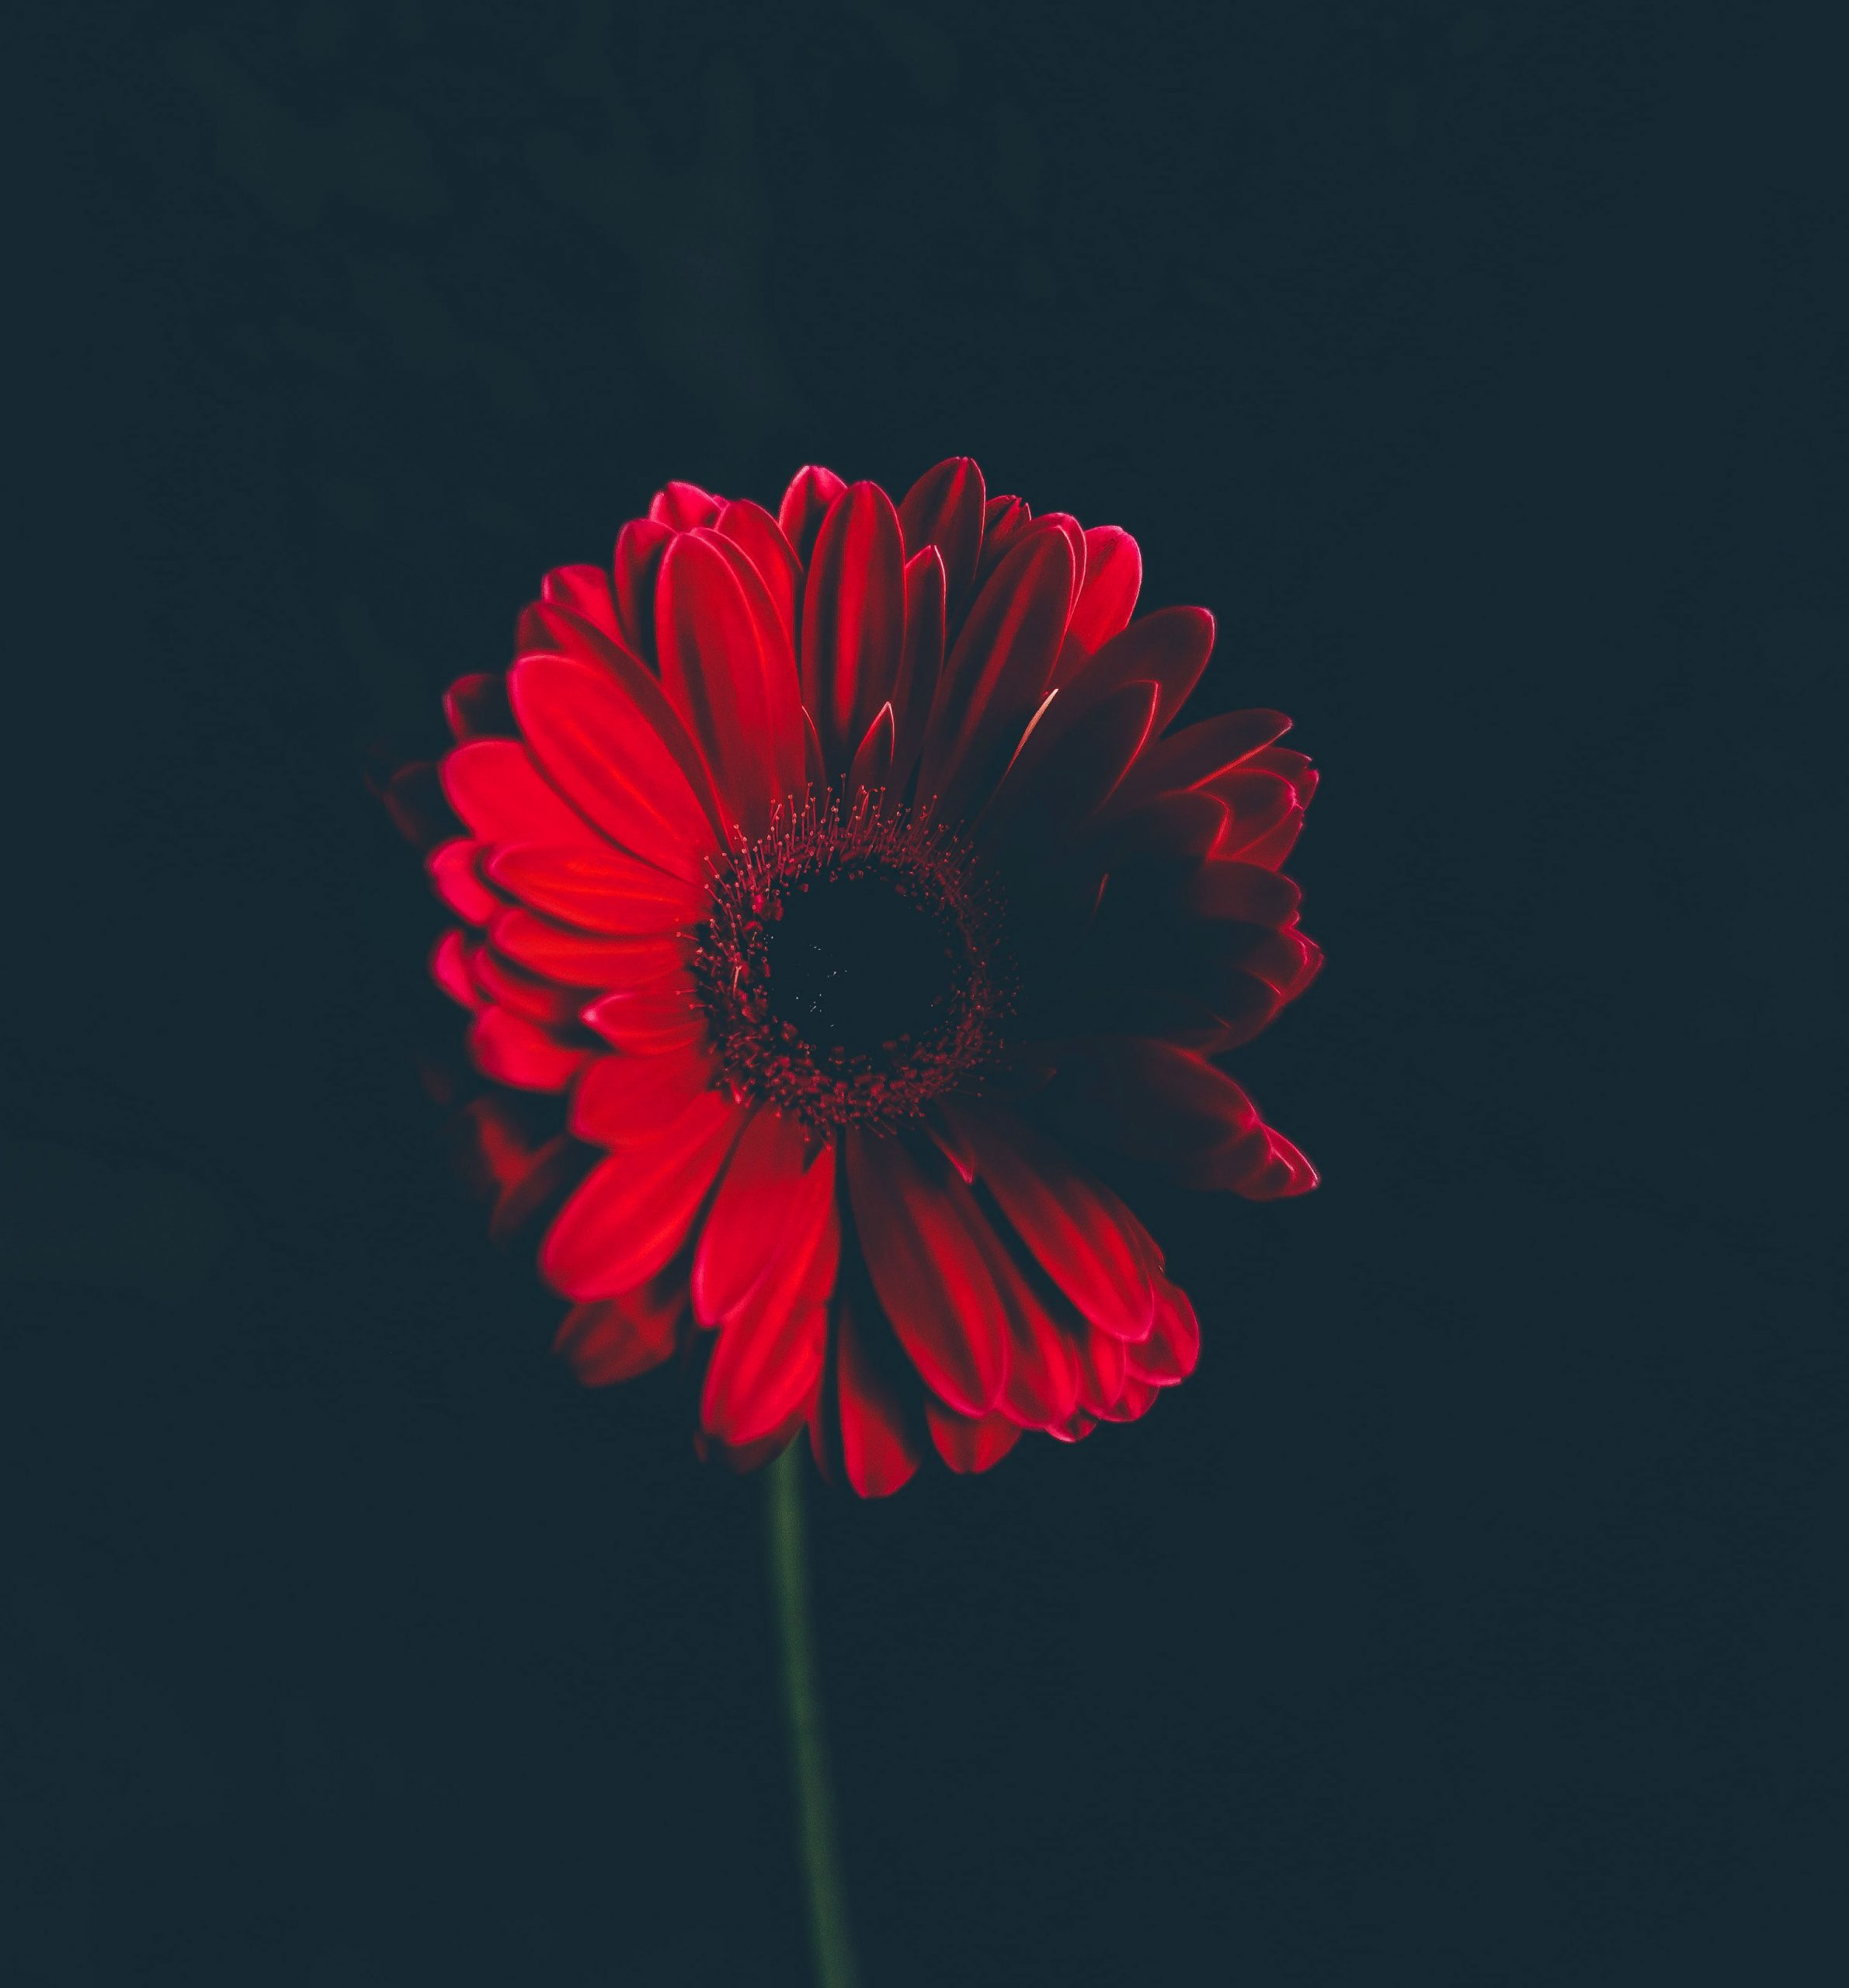 Red Wallpaper photo pics download